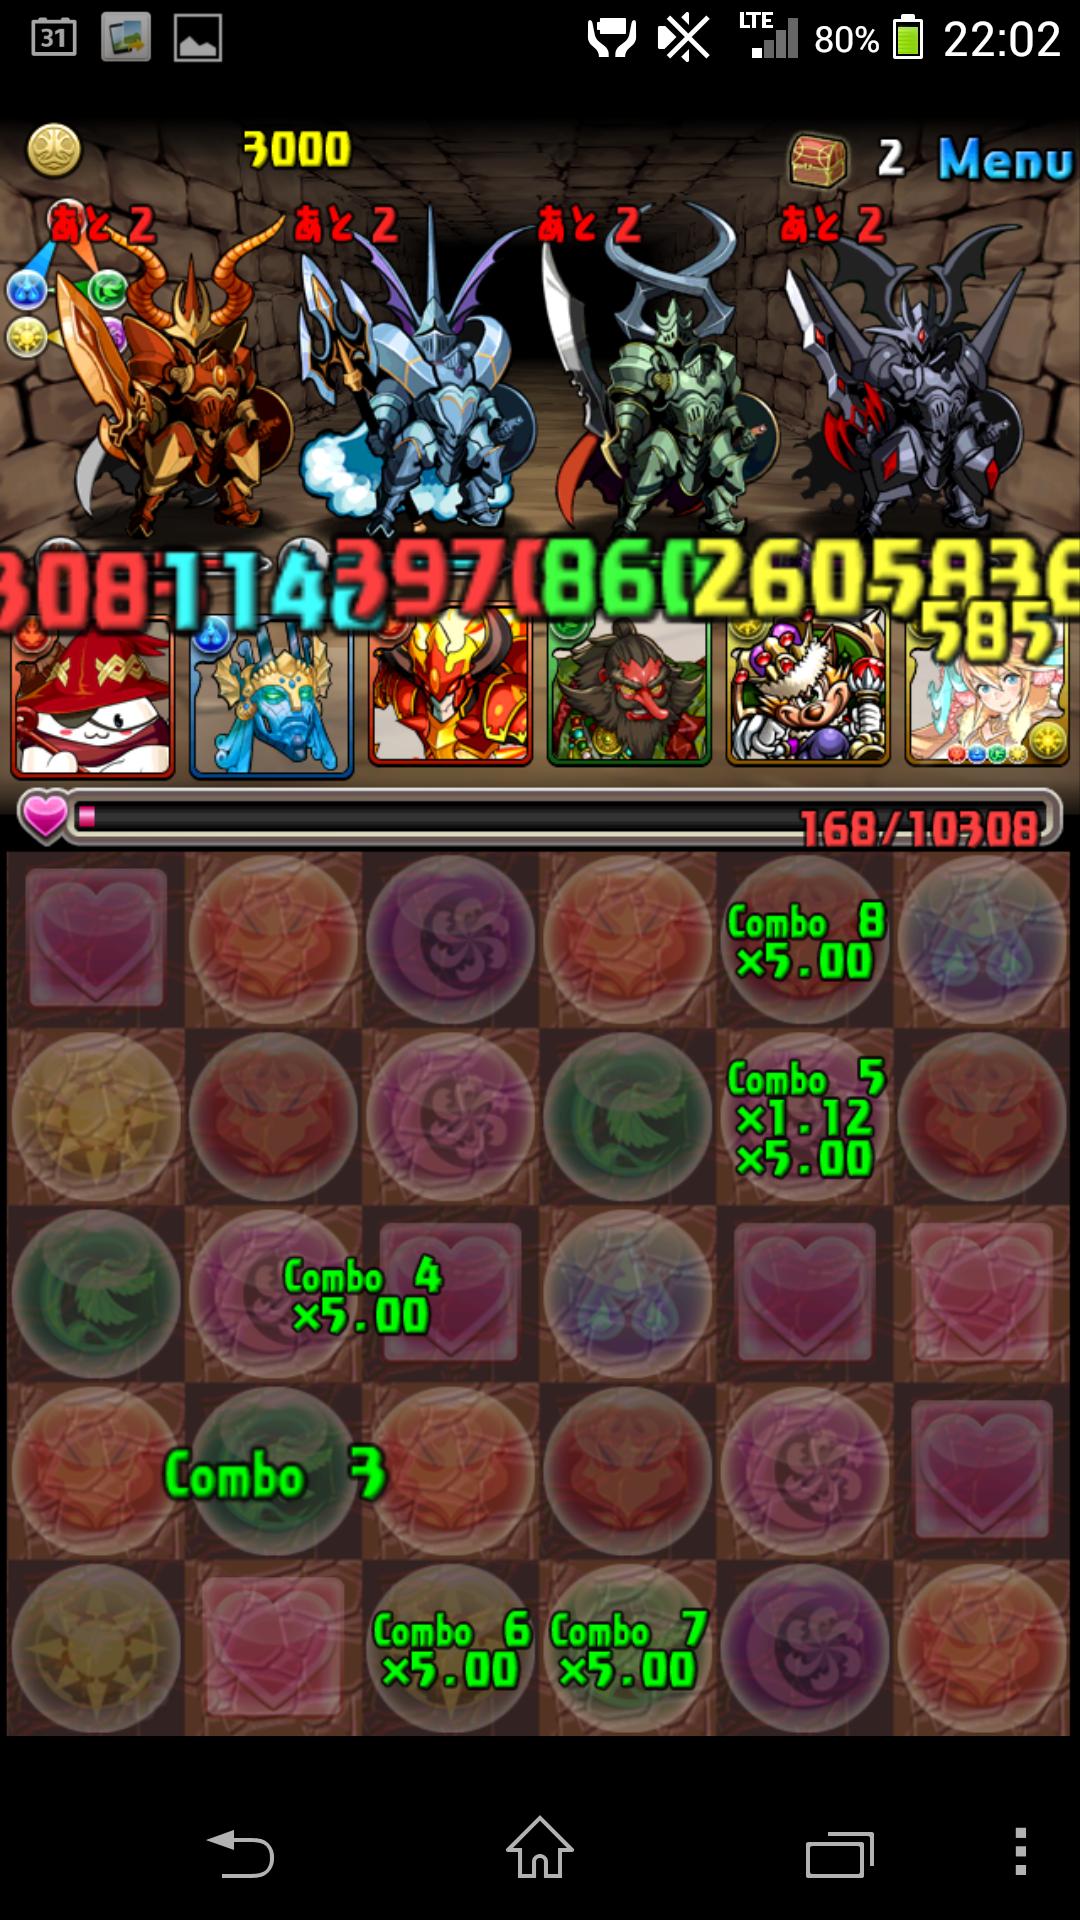 Screenshot_2014-05-12-22-02-03.png